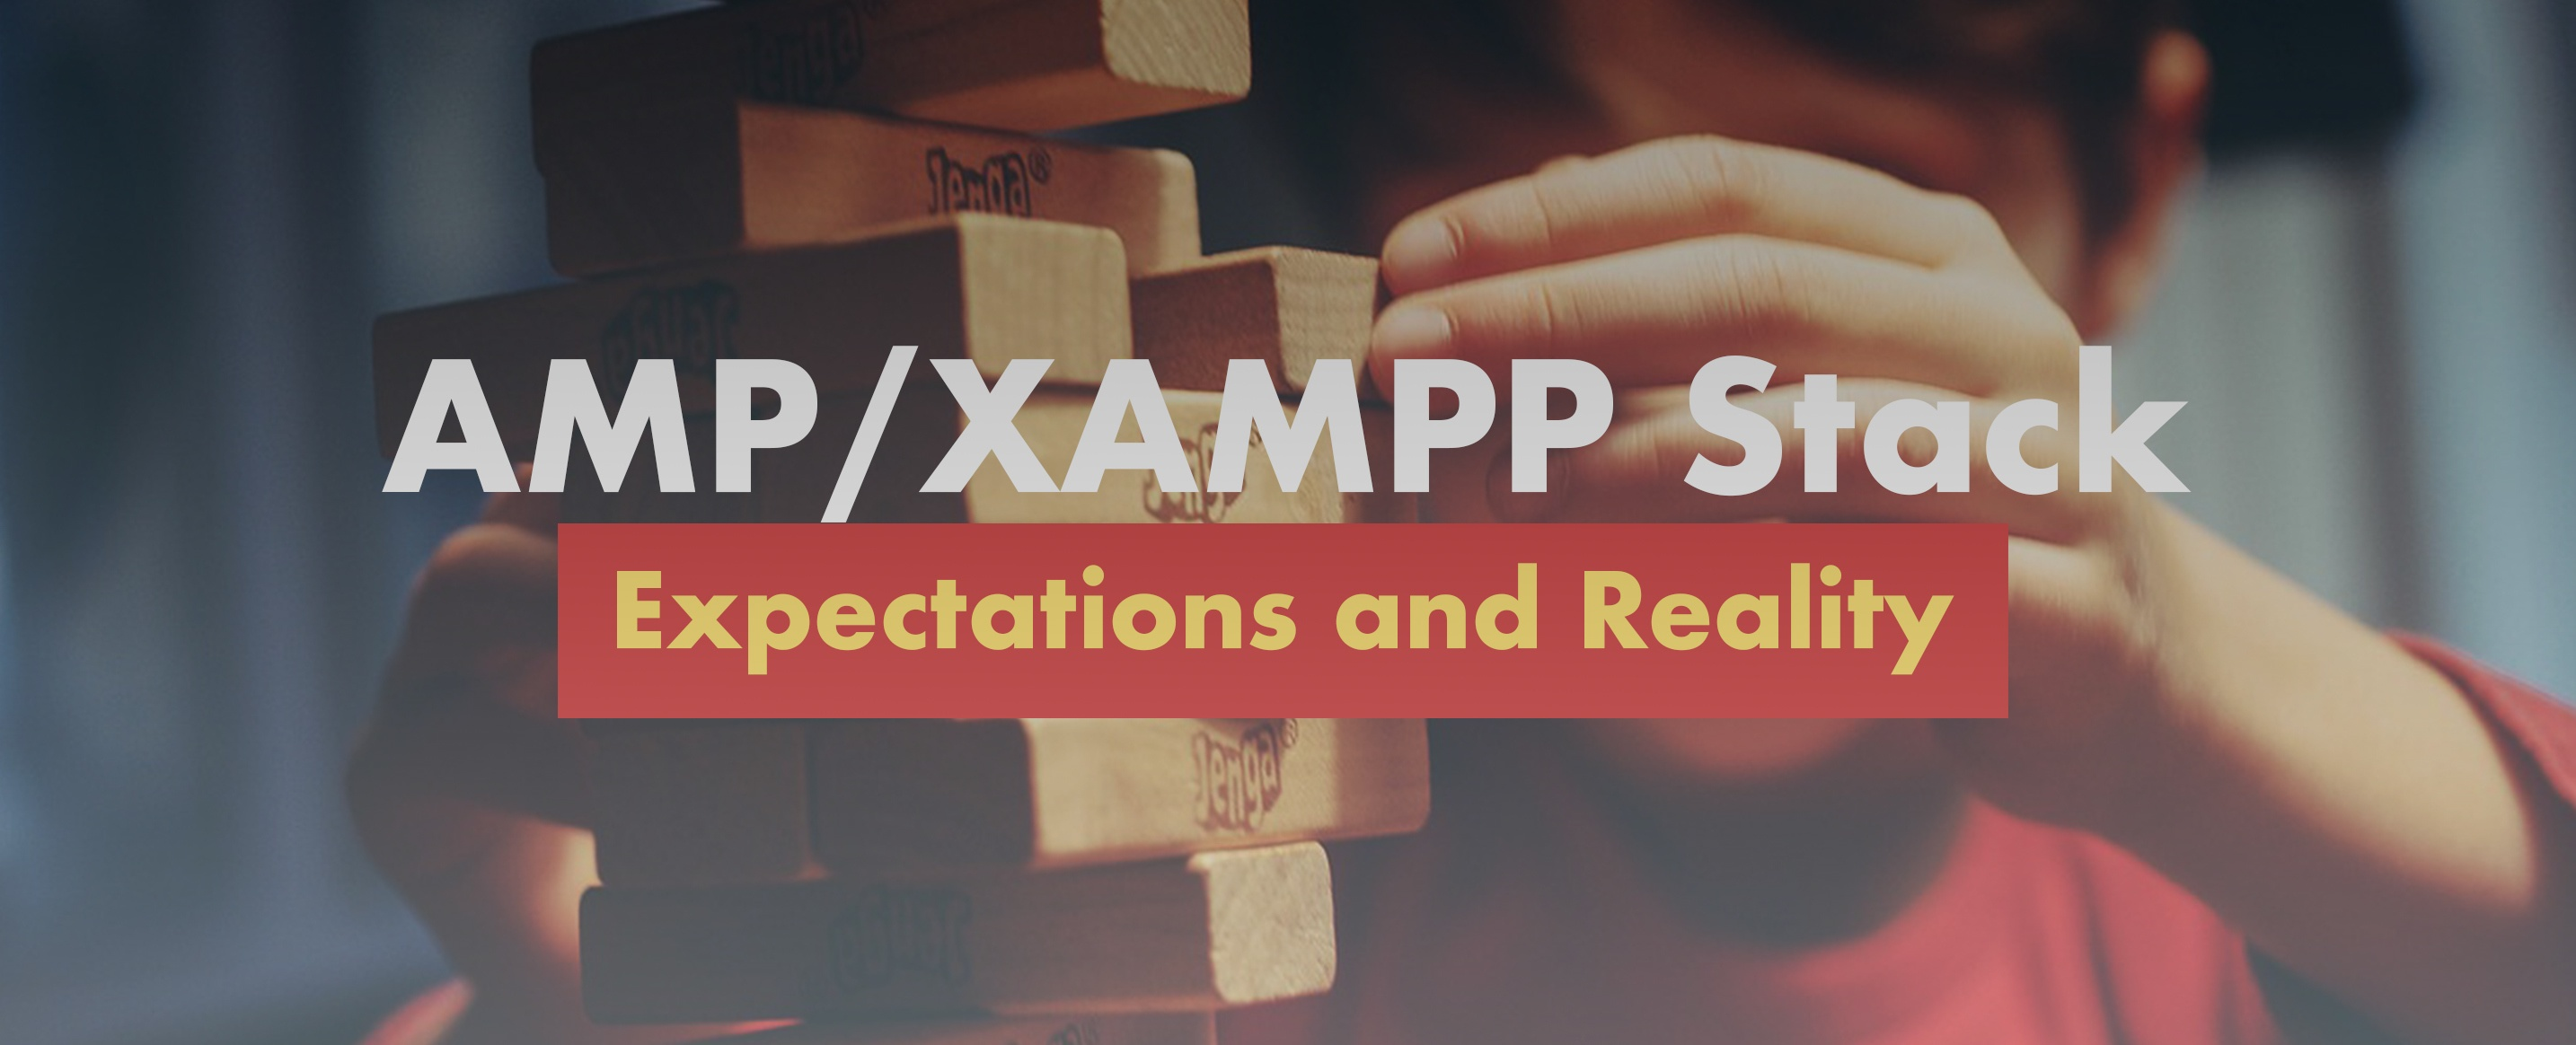 AMP_XAMPP_STACK_BG1